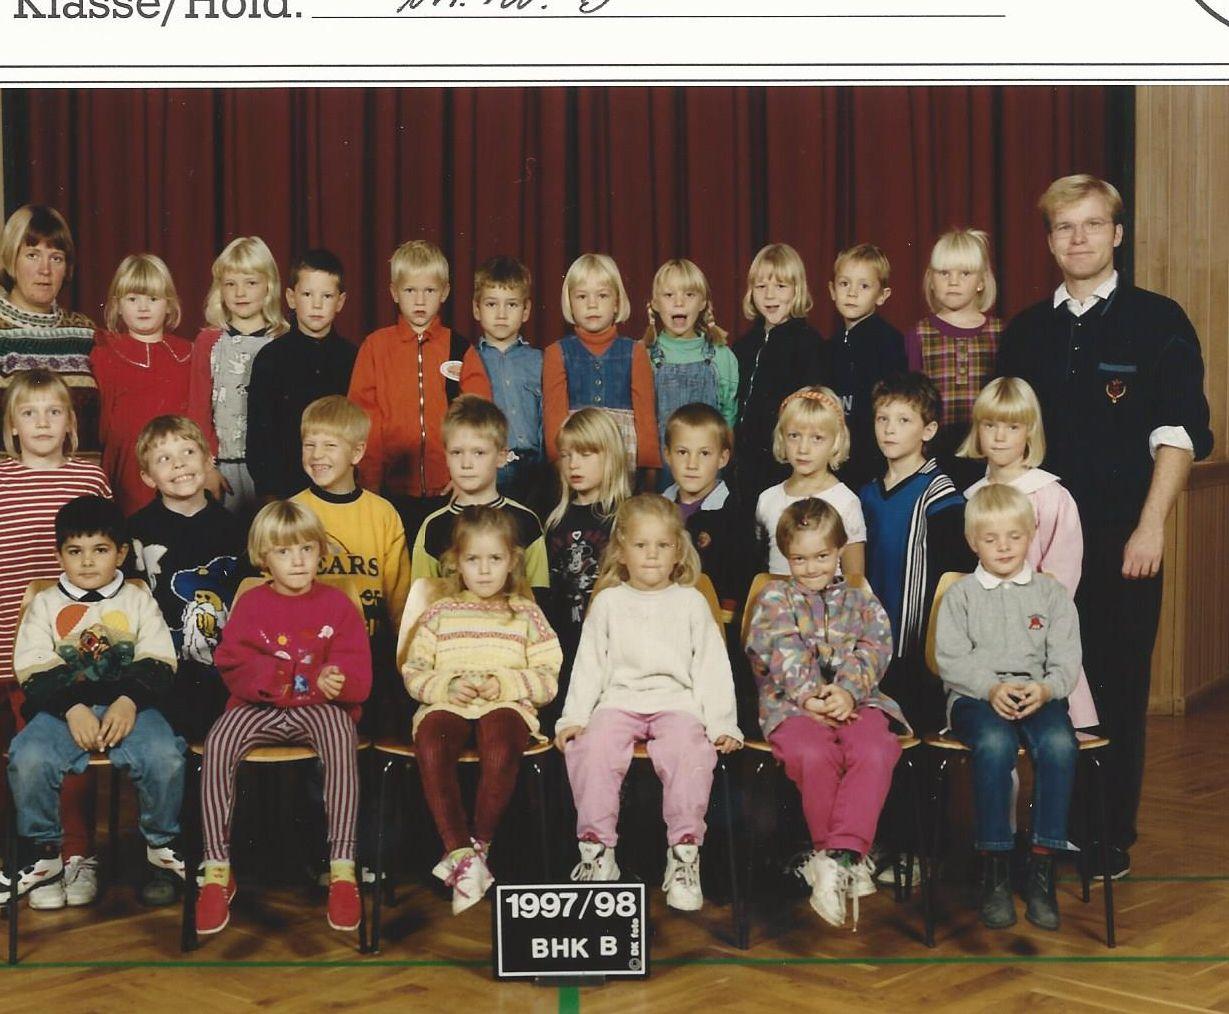 1997-0b